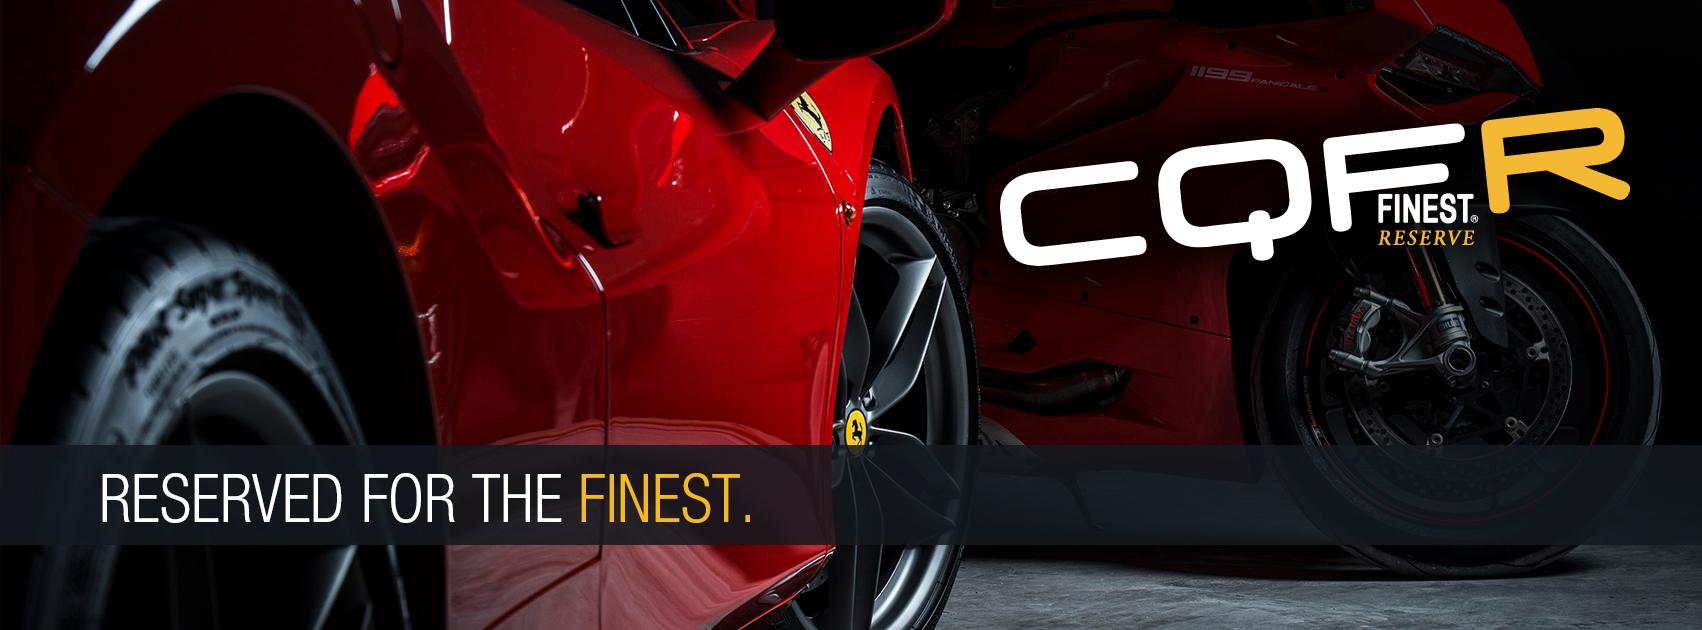 web-banner-CQFR.jpg